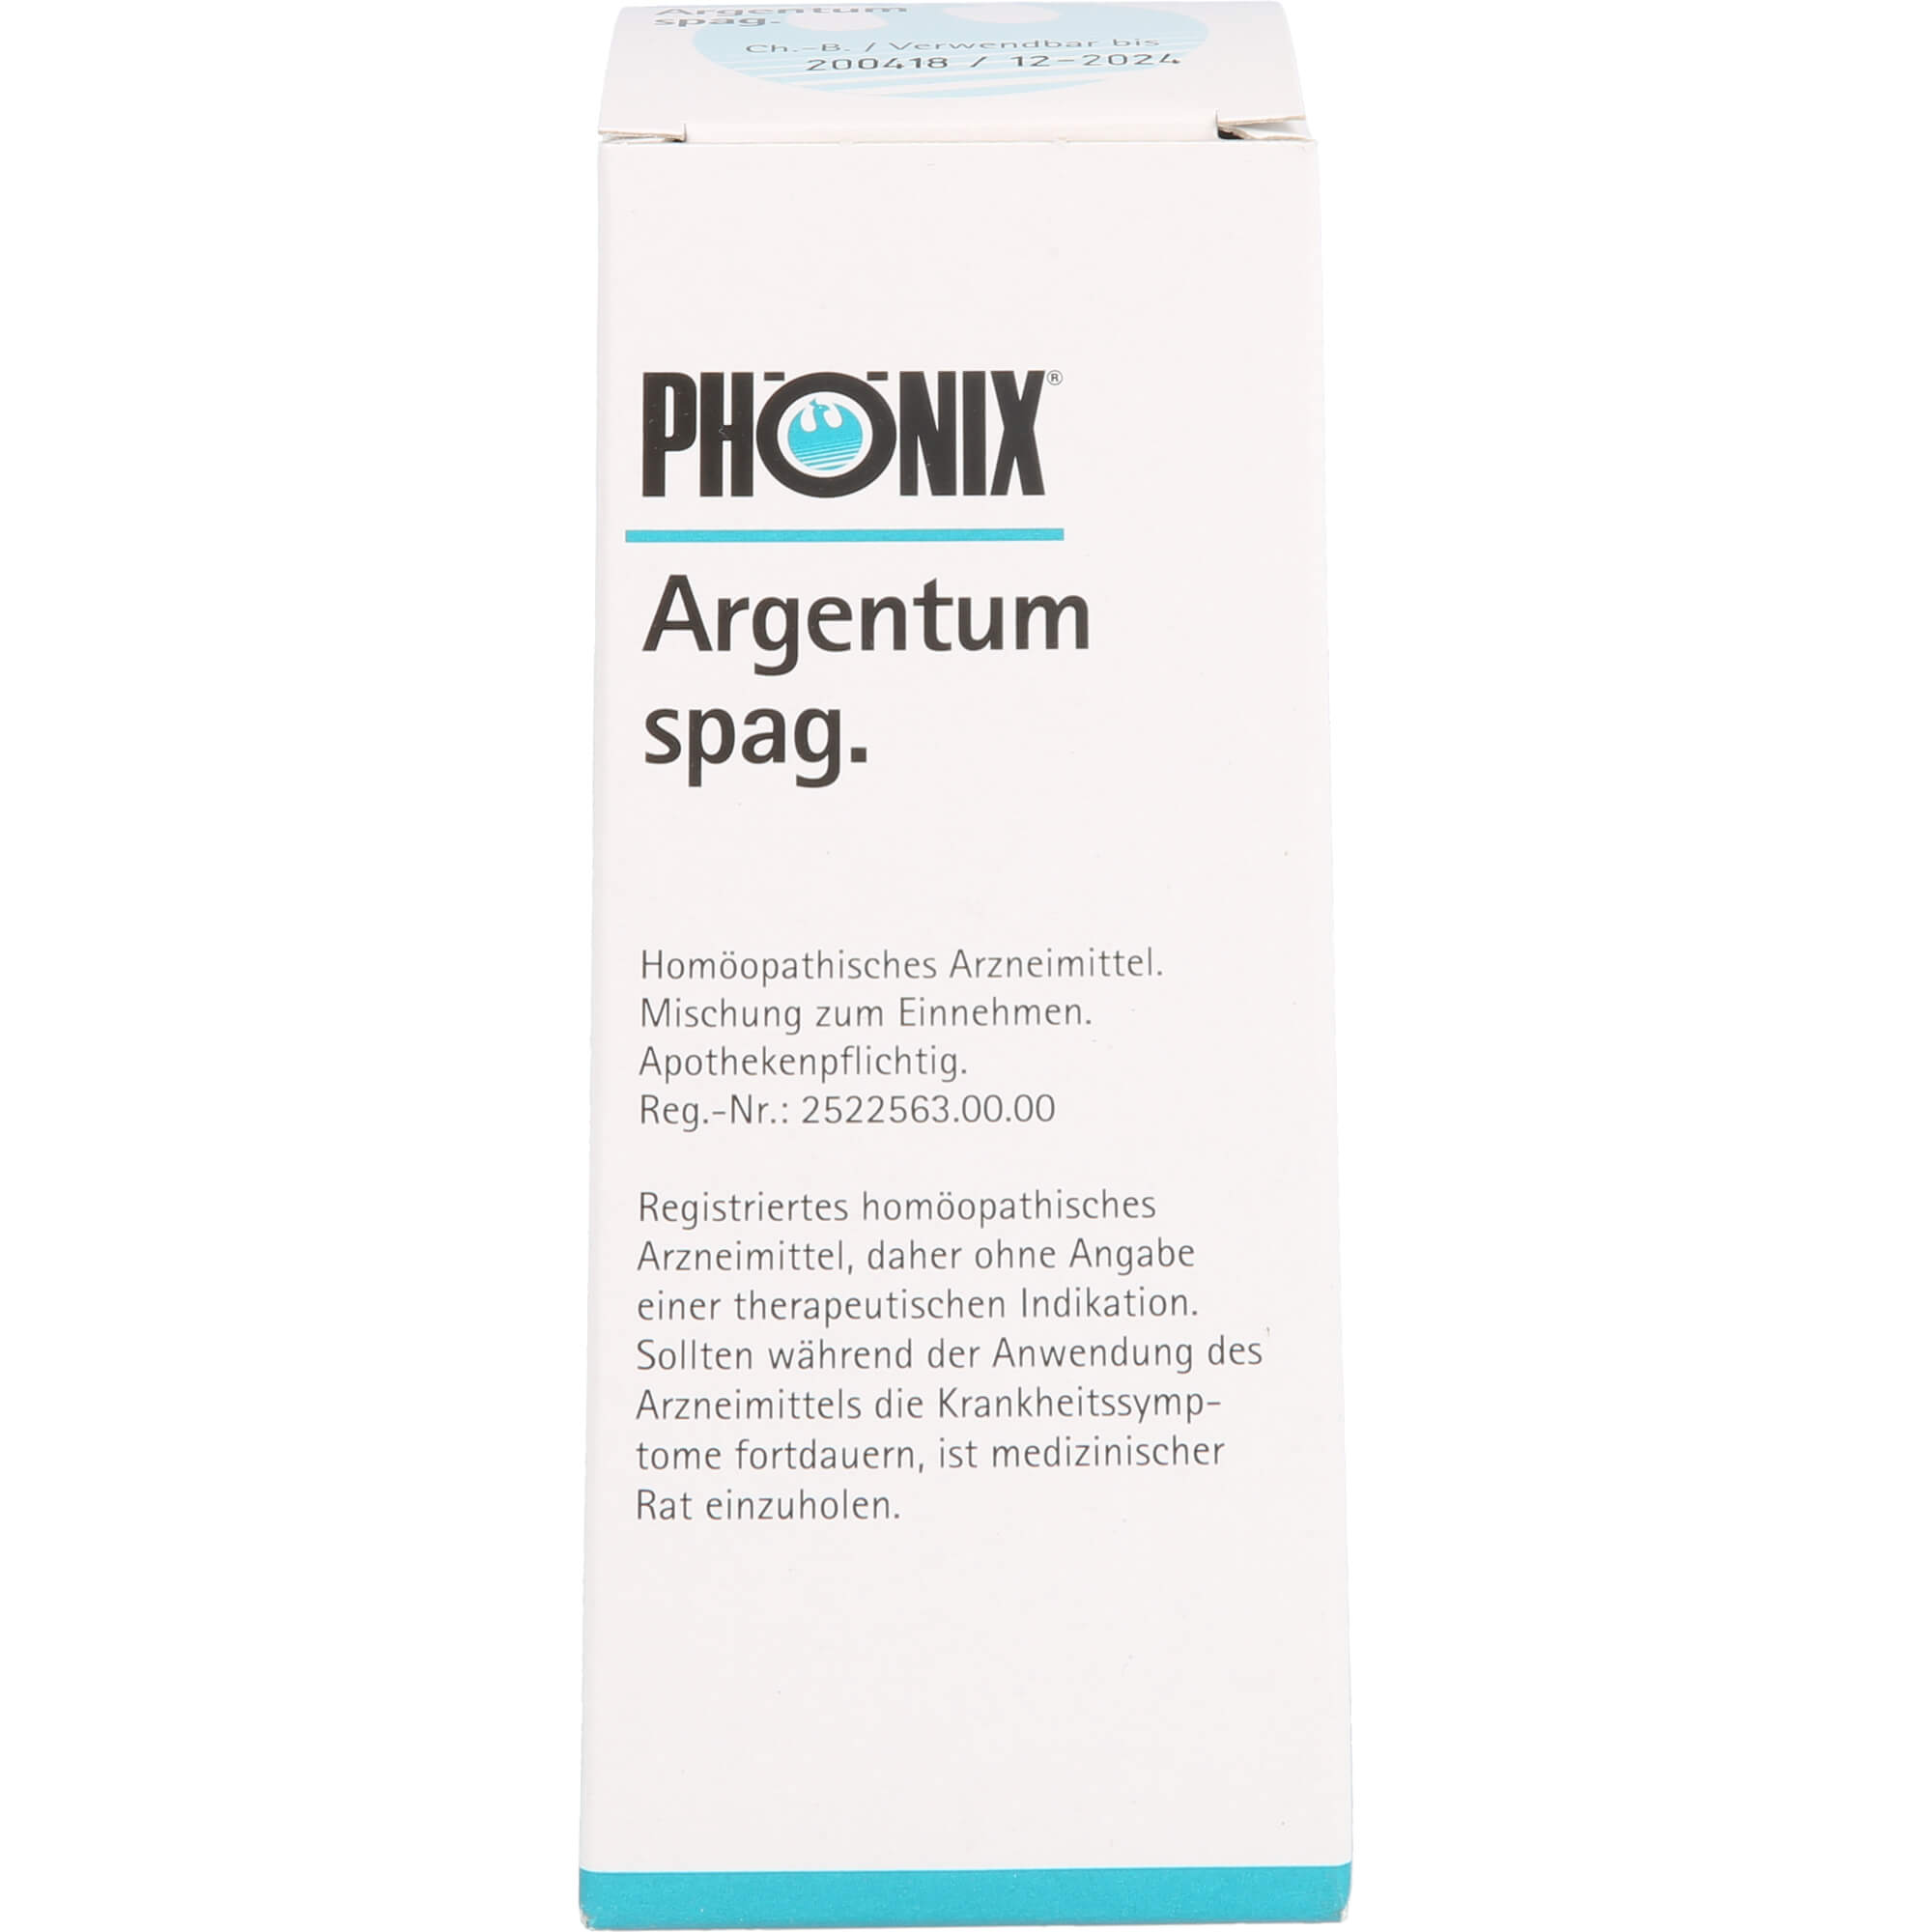 PHOeNIX-ARGENTUM-spag-Mischung